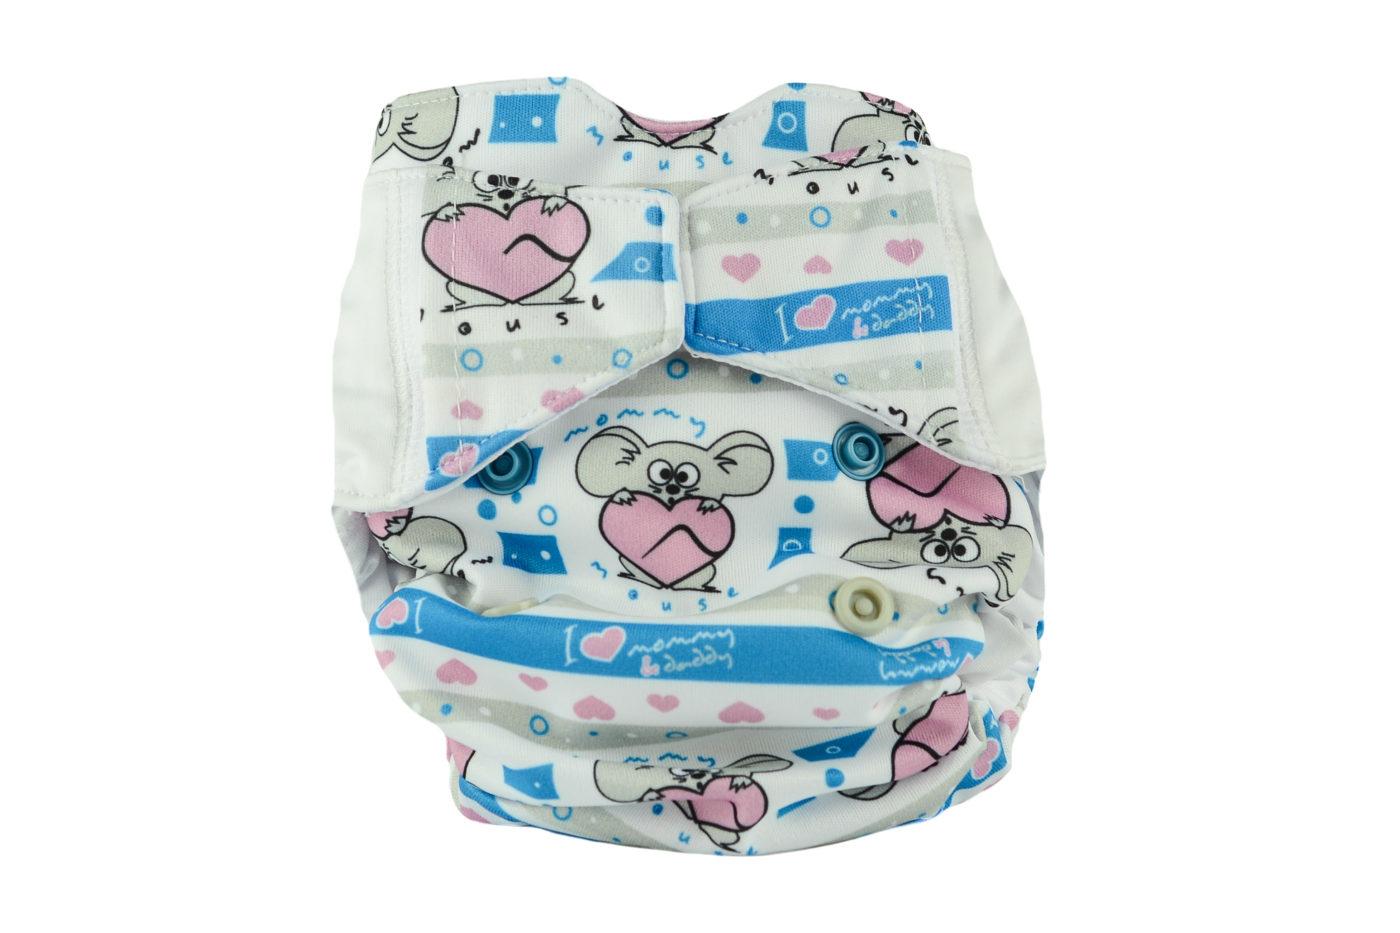 Diaper AIO Newborn (MOJE SERDUSZKO)